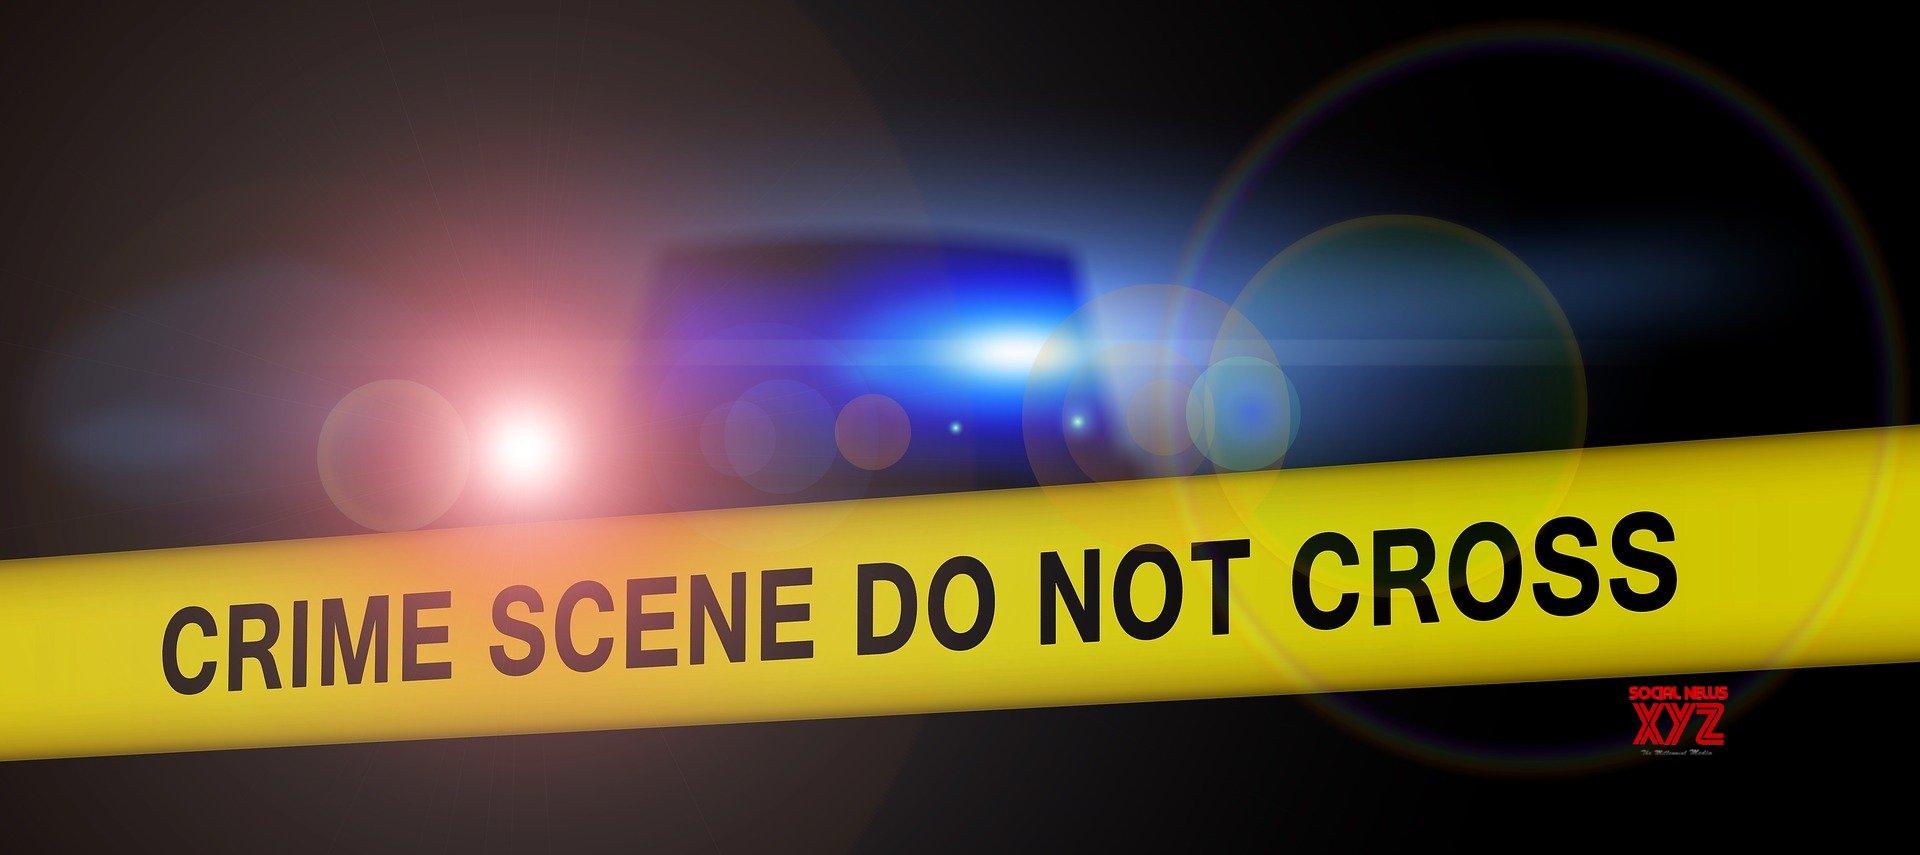 Bullet-ridden bodies of 2 doctors found in car in Delhi